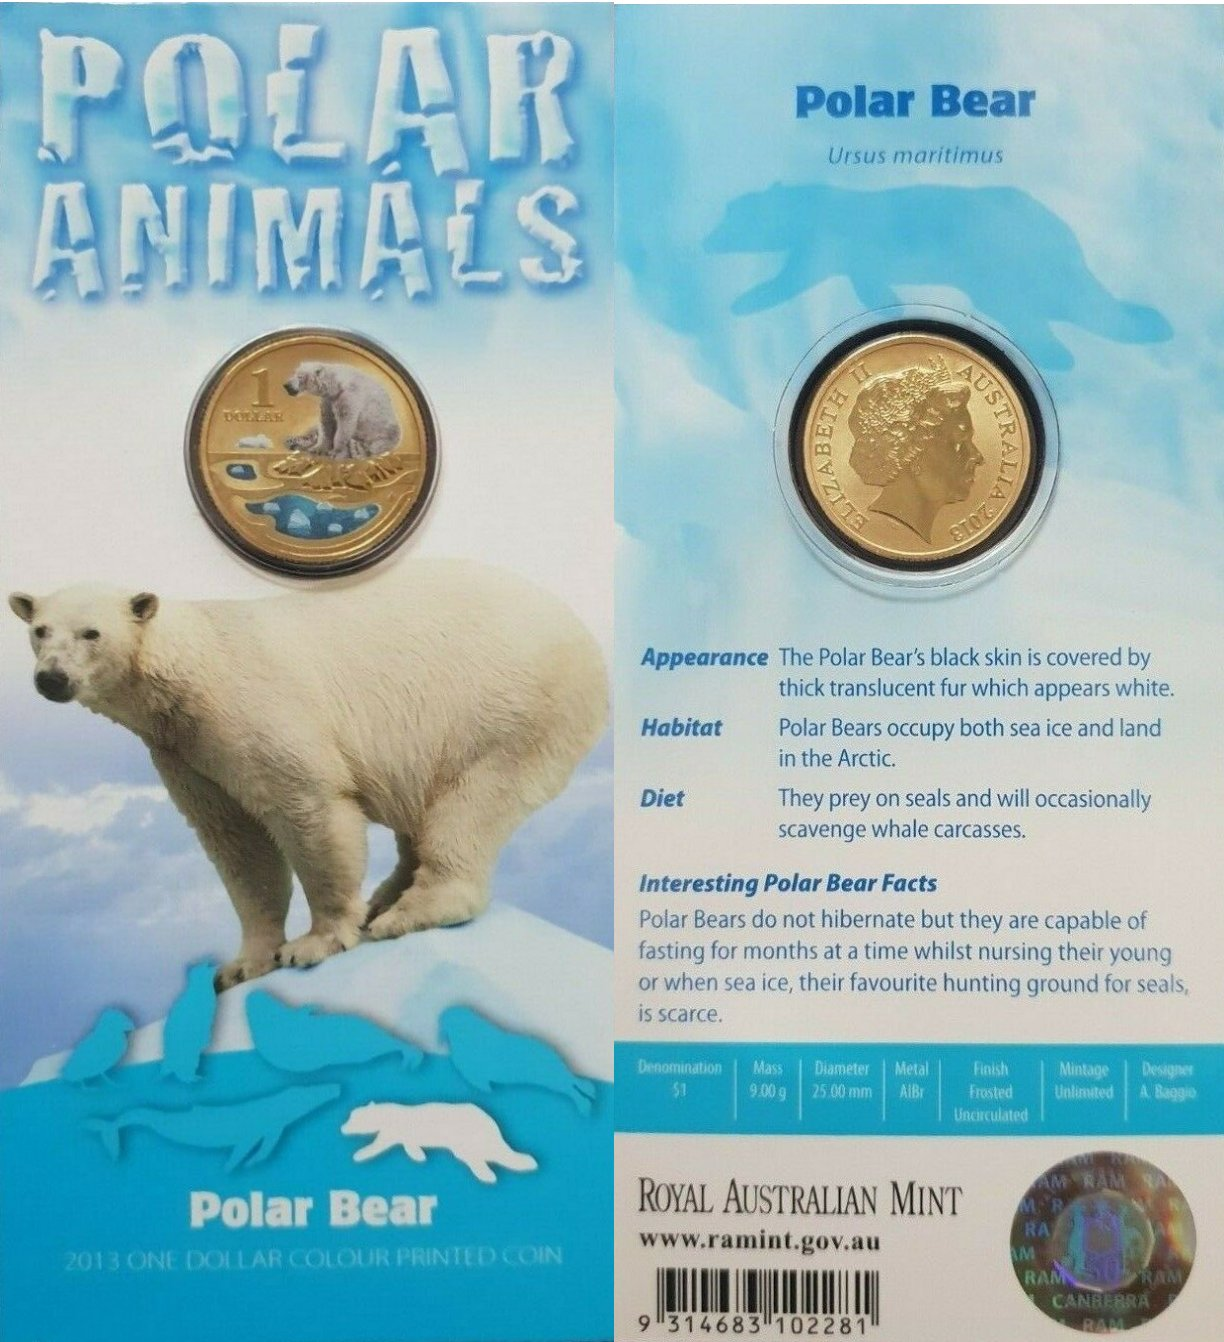 2013 $1 POLAR ANIMALS WALRUS Pad Printed Coin